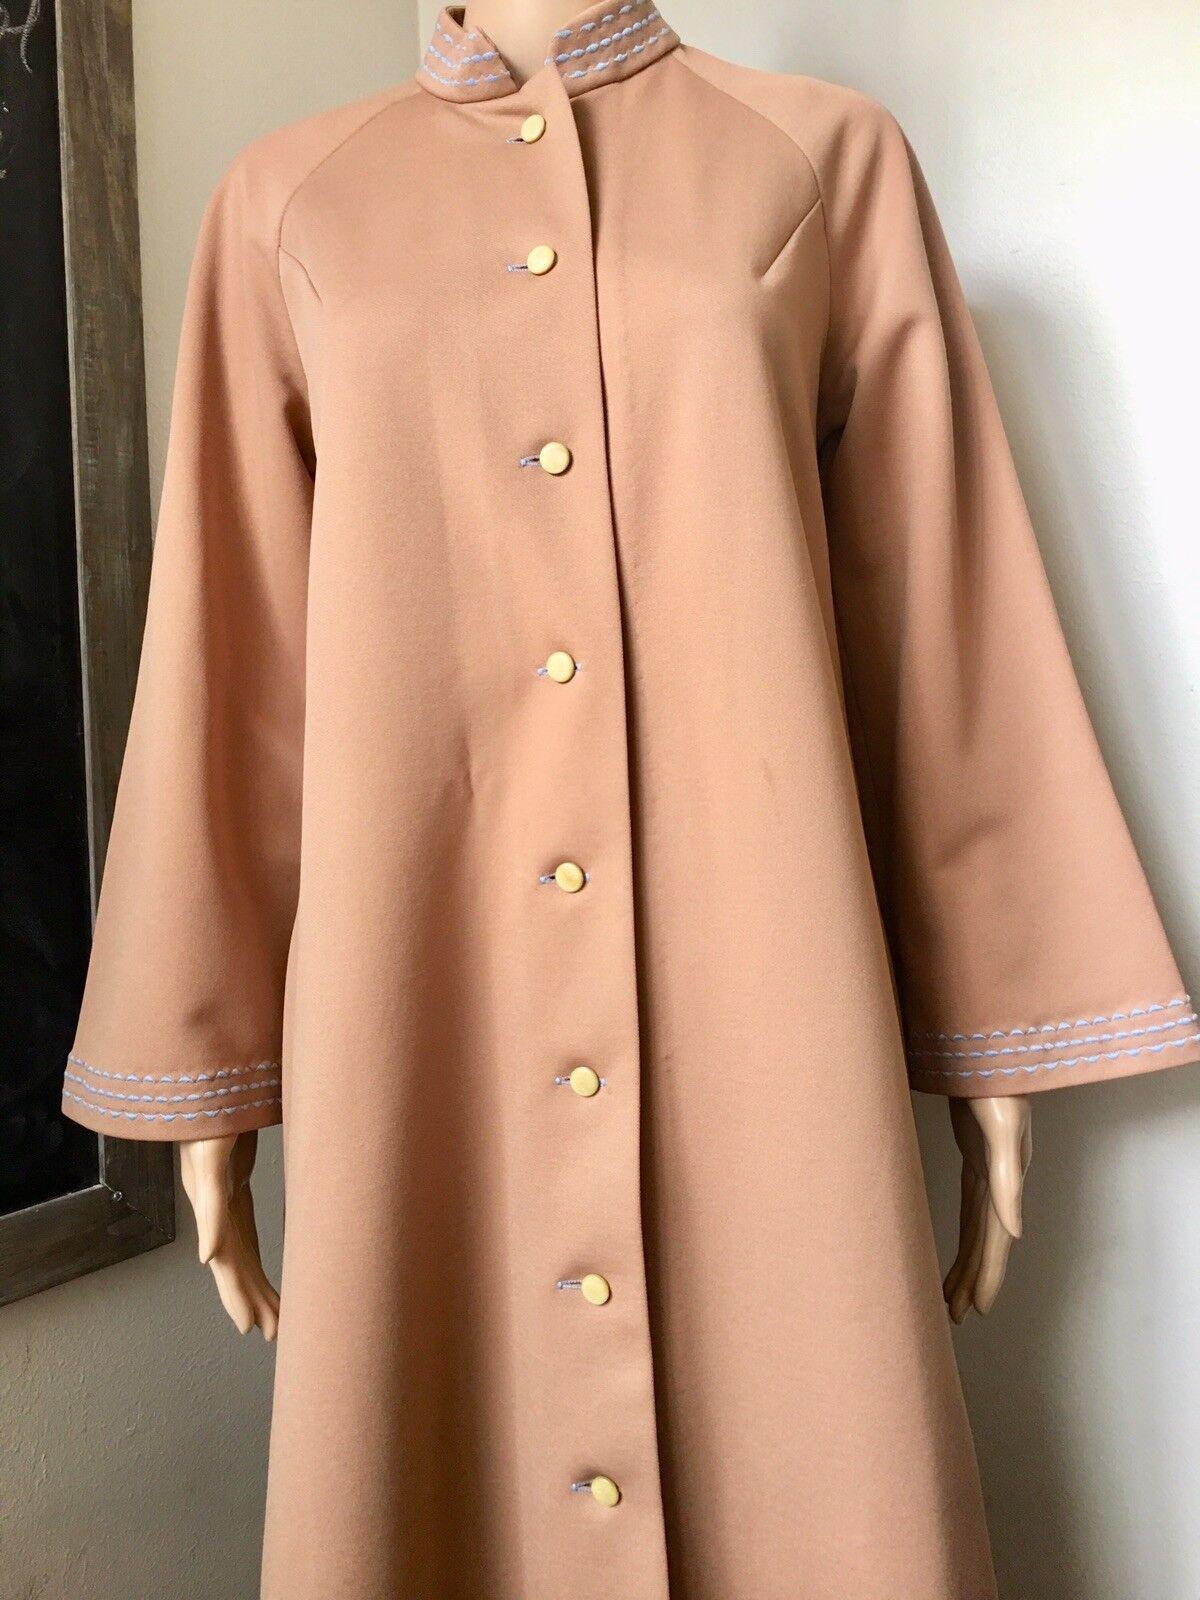 Vintage Floor Length Dress Coat Camel Embroidered Button Down Costume Unlabeled